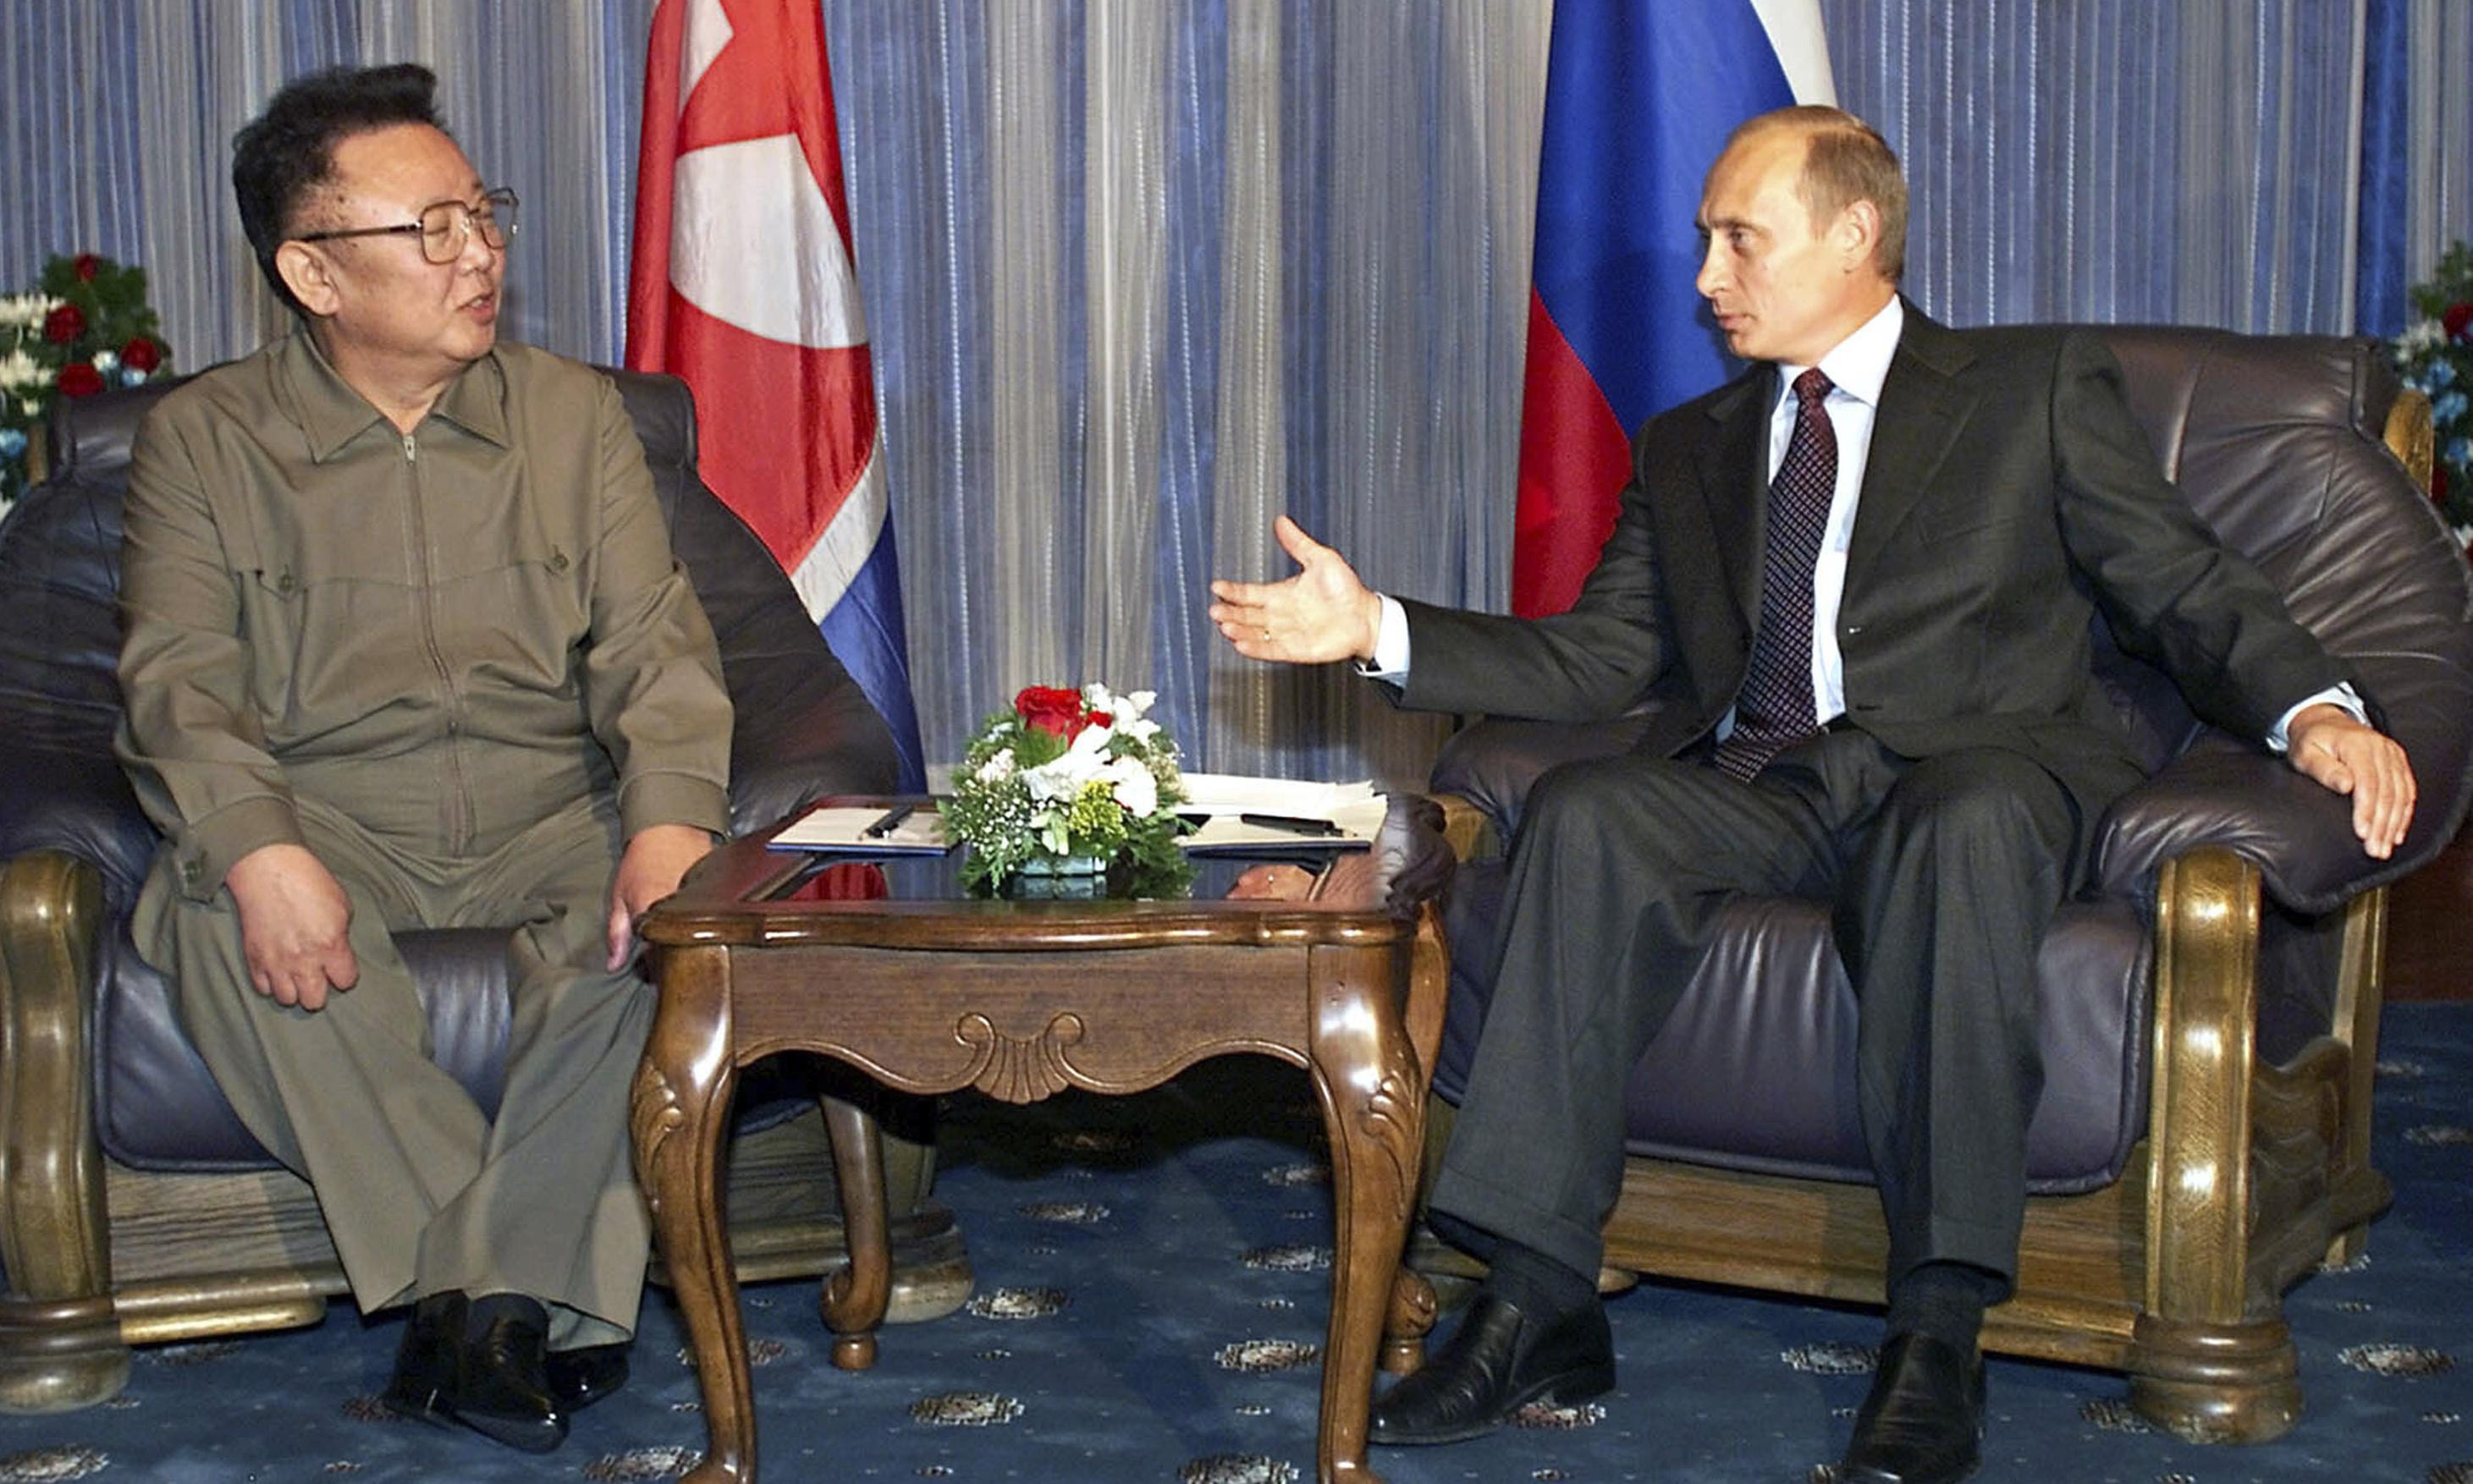 Kim Jong-un meets Vladimir Putin for first time at Vladivostok summit